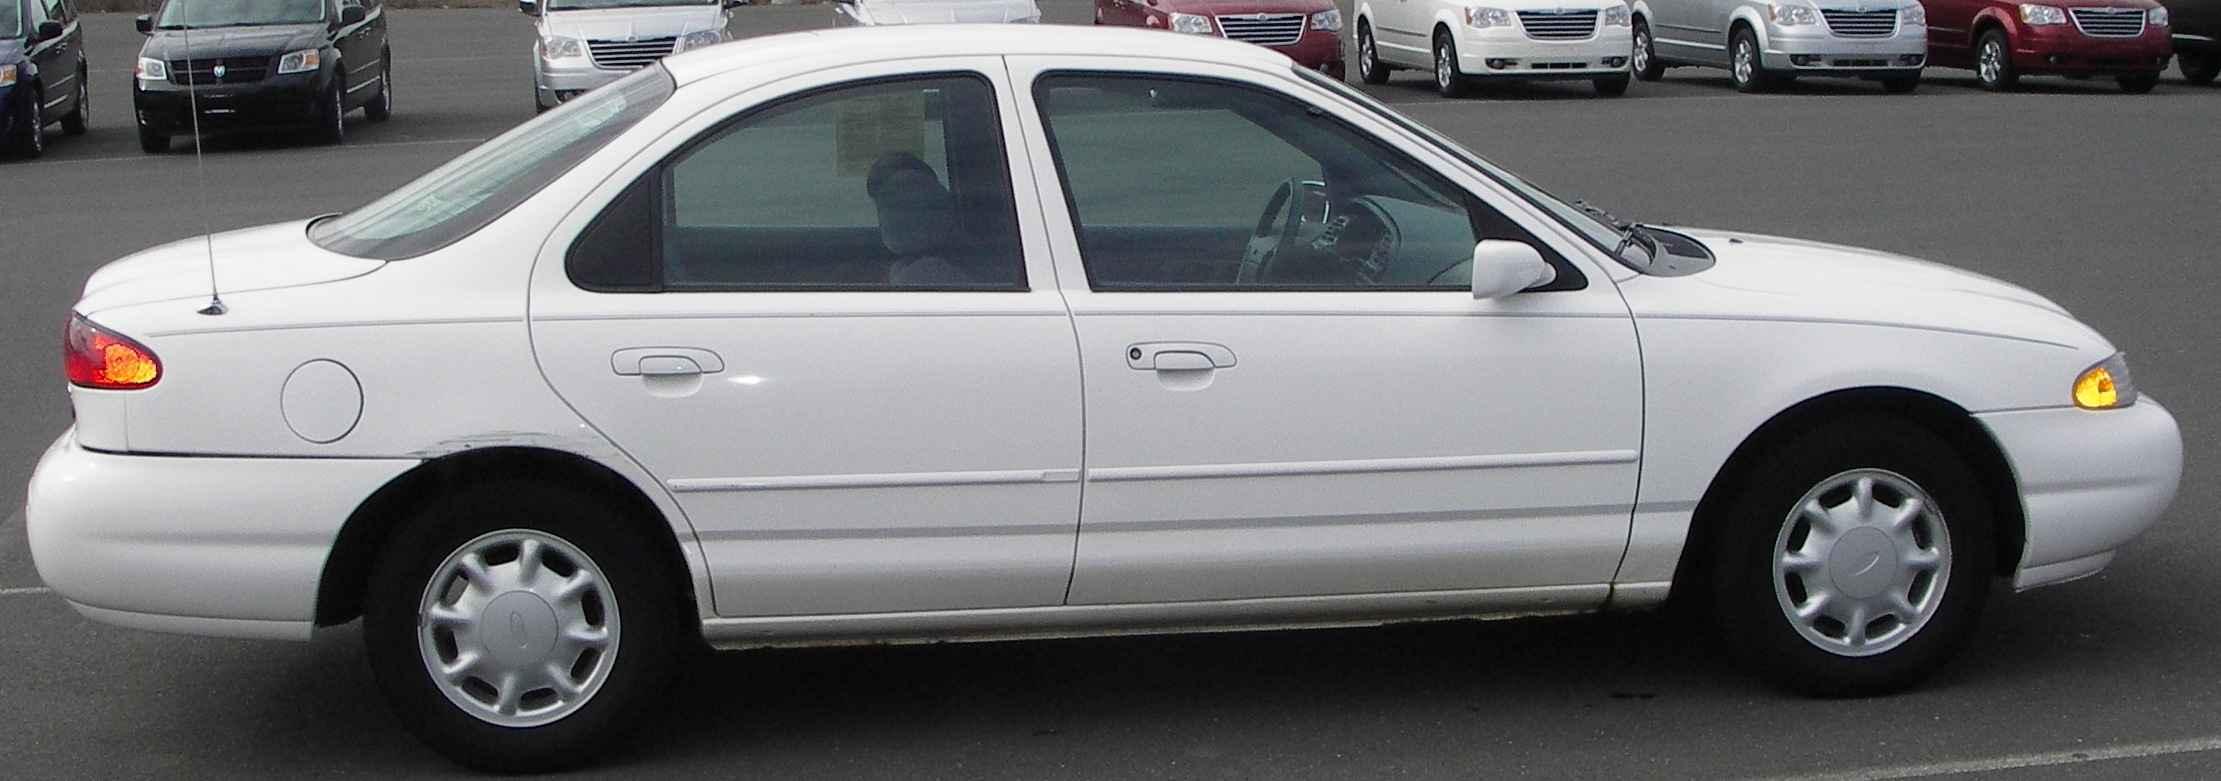 1996 Ford Contour Image 10